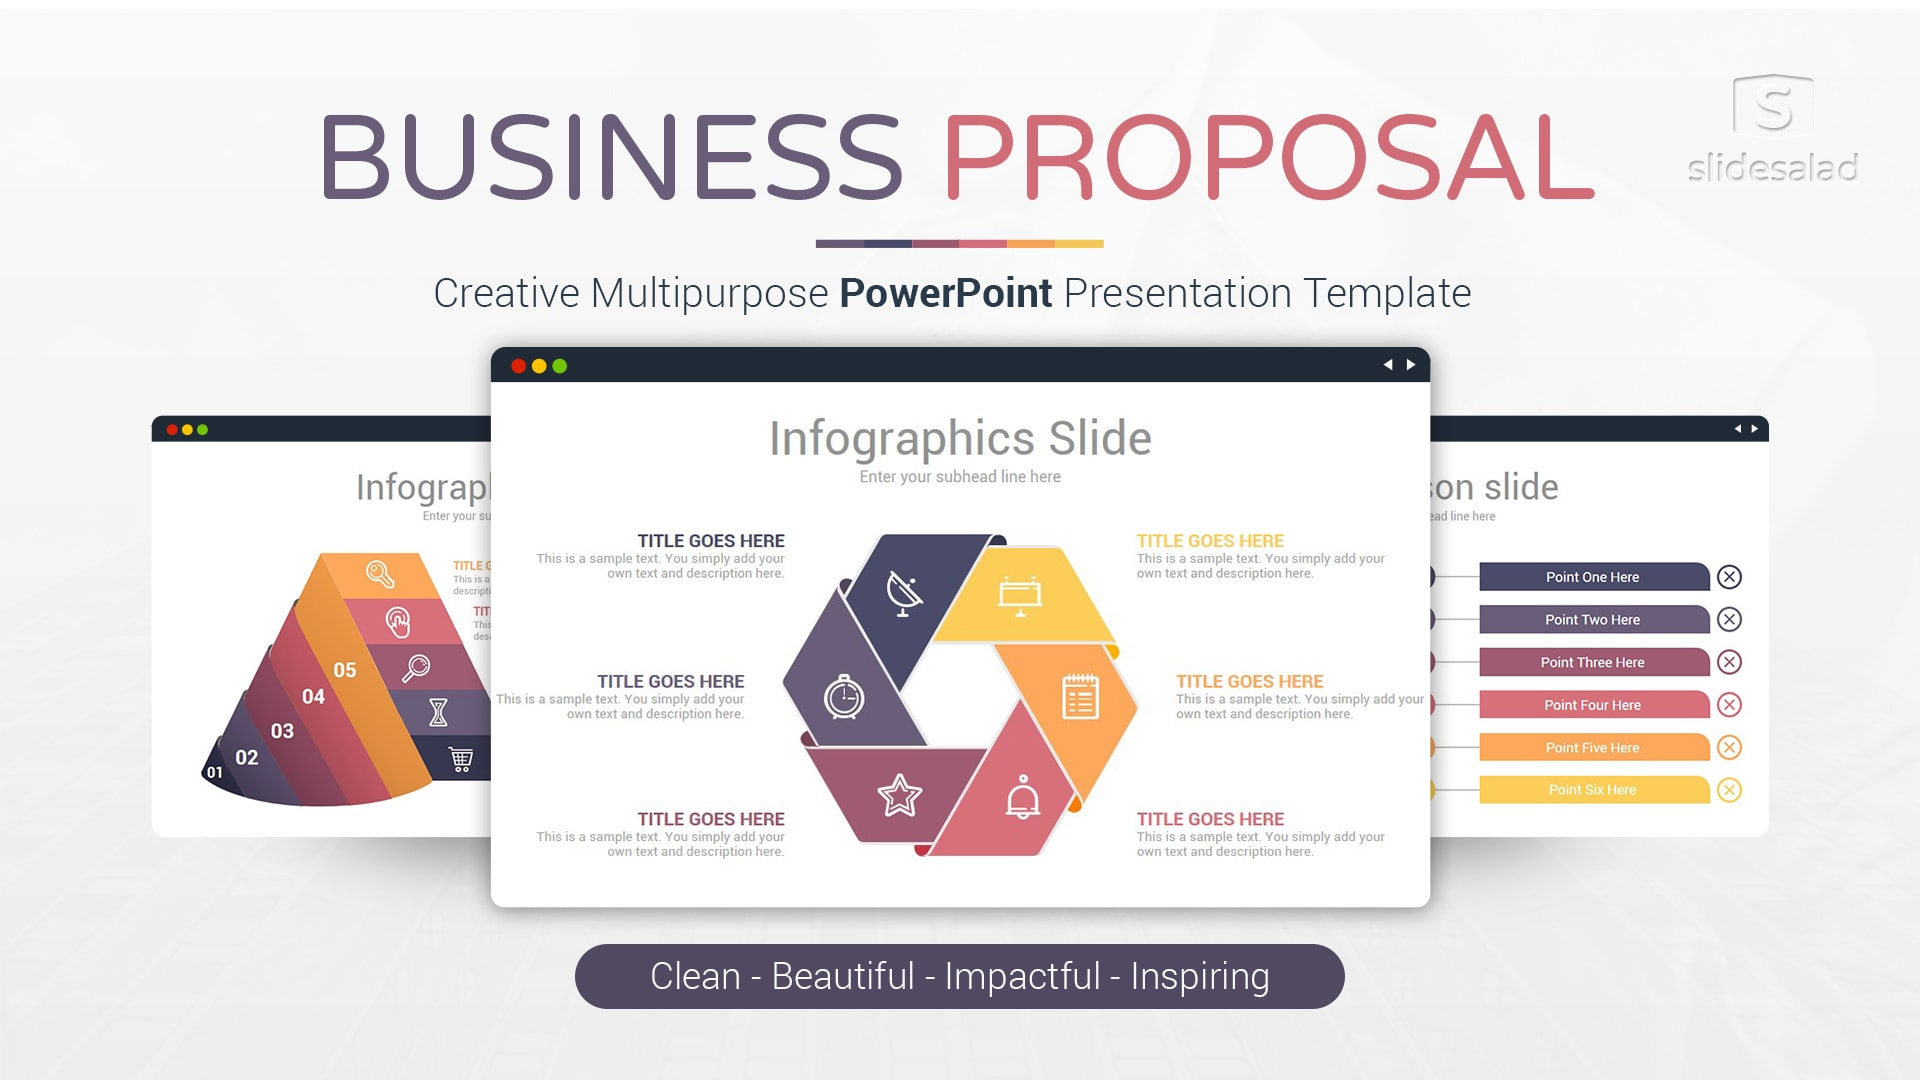 Business Proposal PowerPoint Presentation Template – Elegant PowerPoint Pitch Template Deck